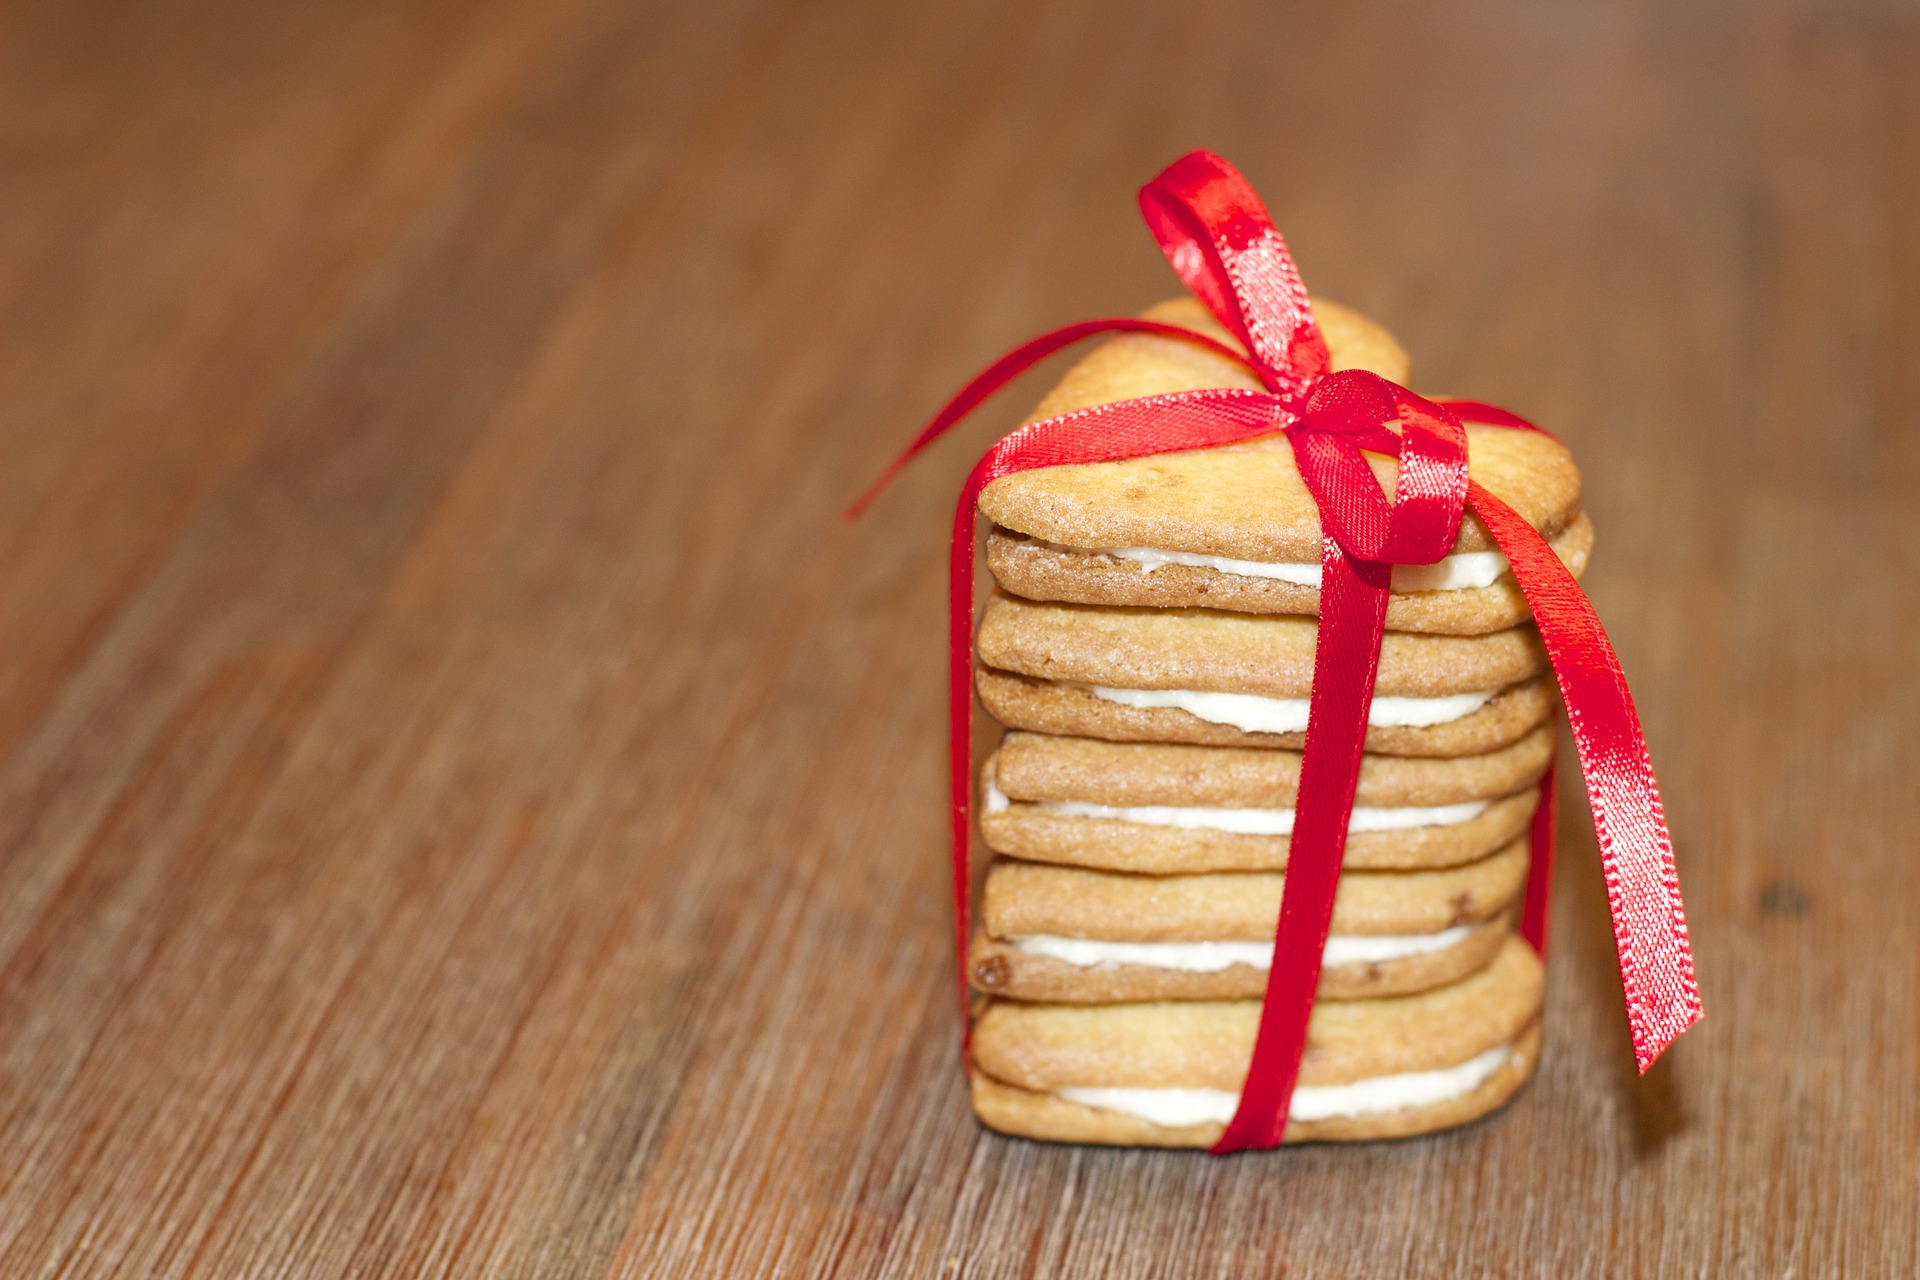 jedlé darčeky bez lepku